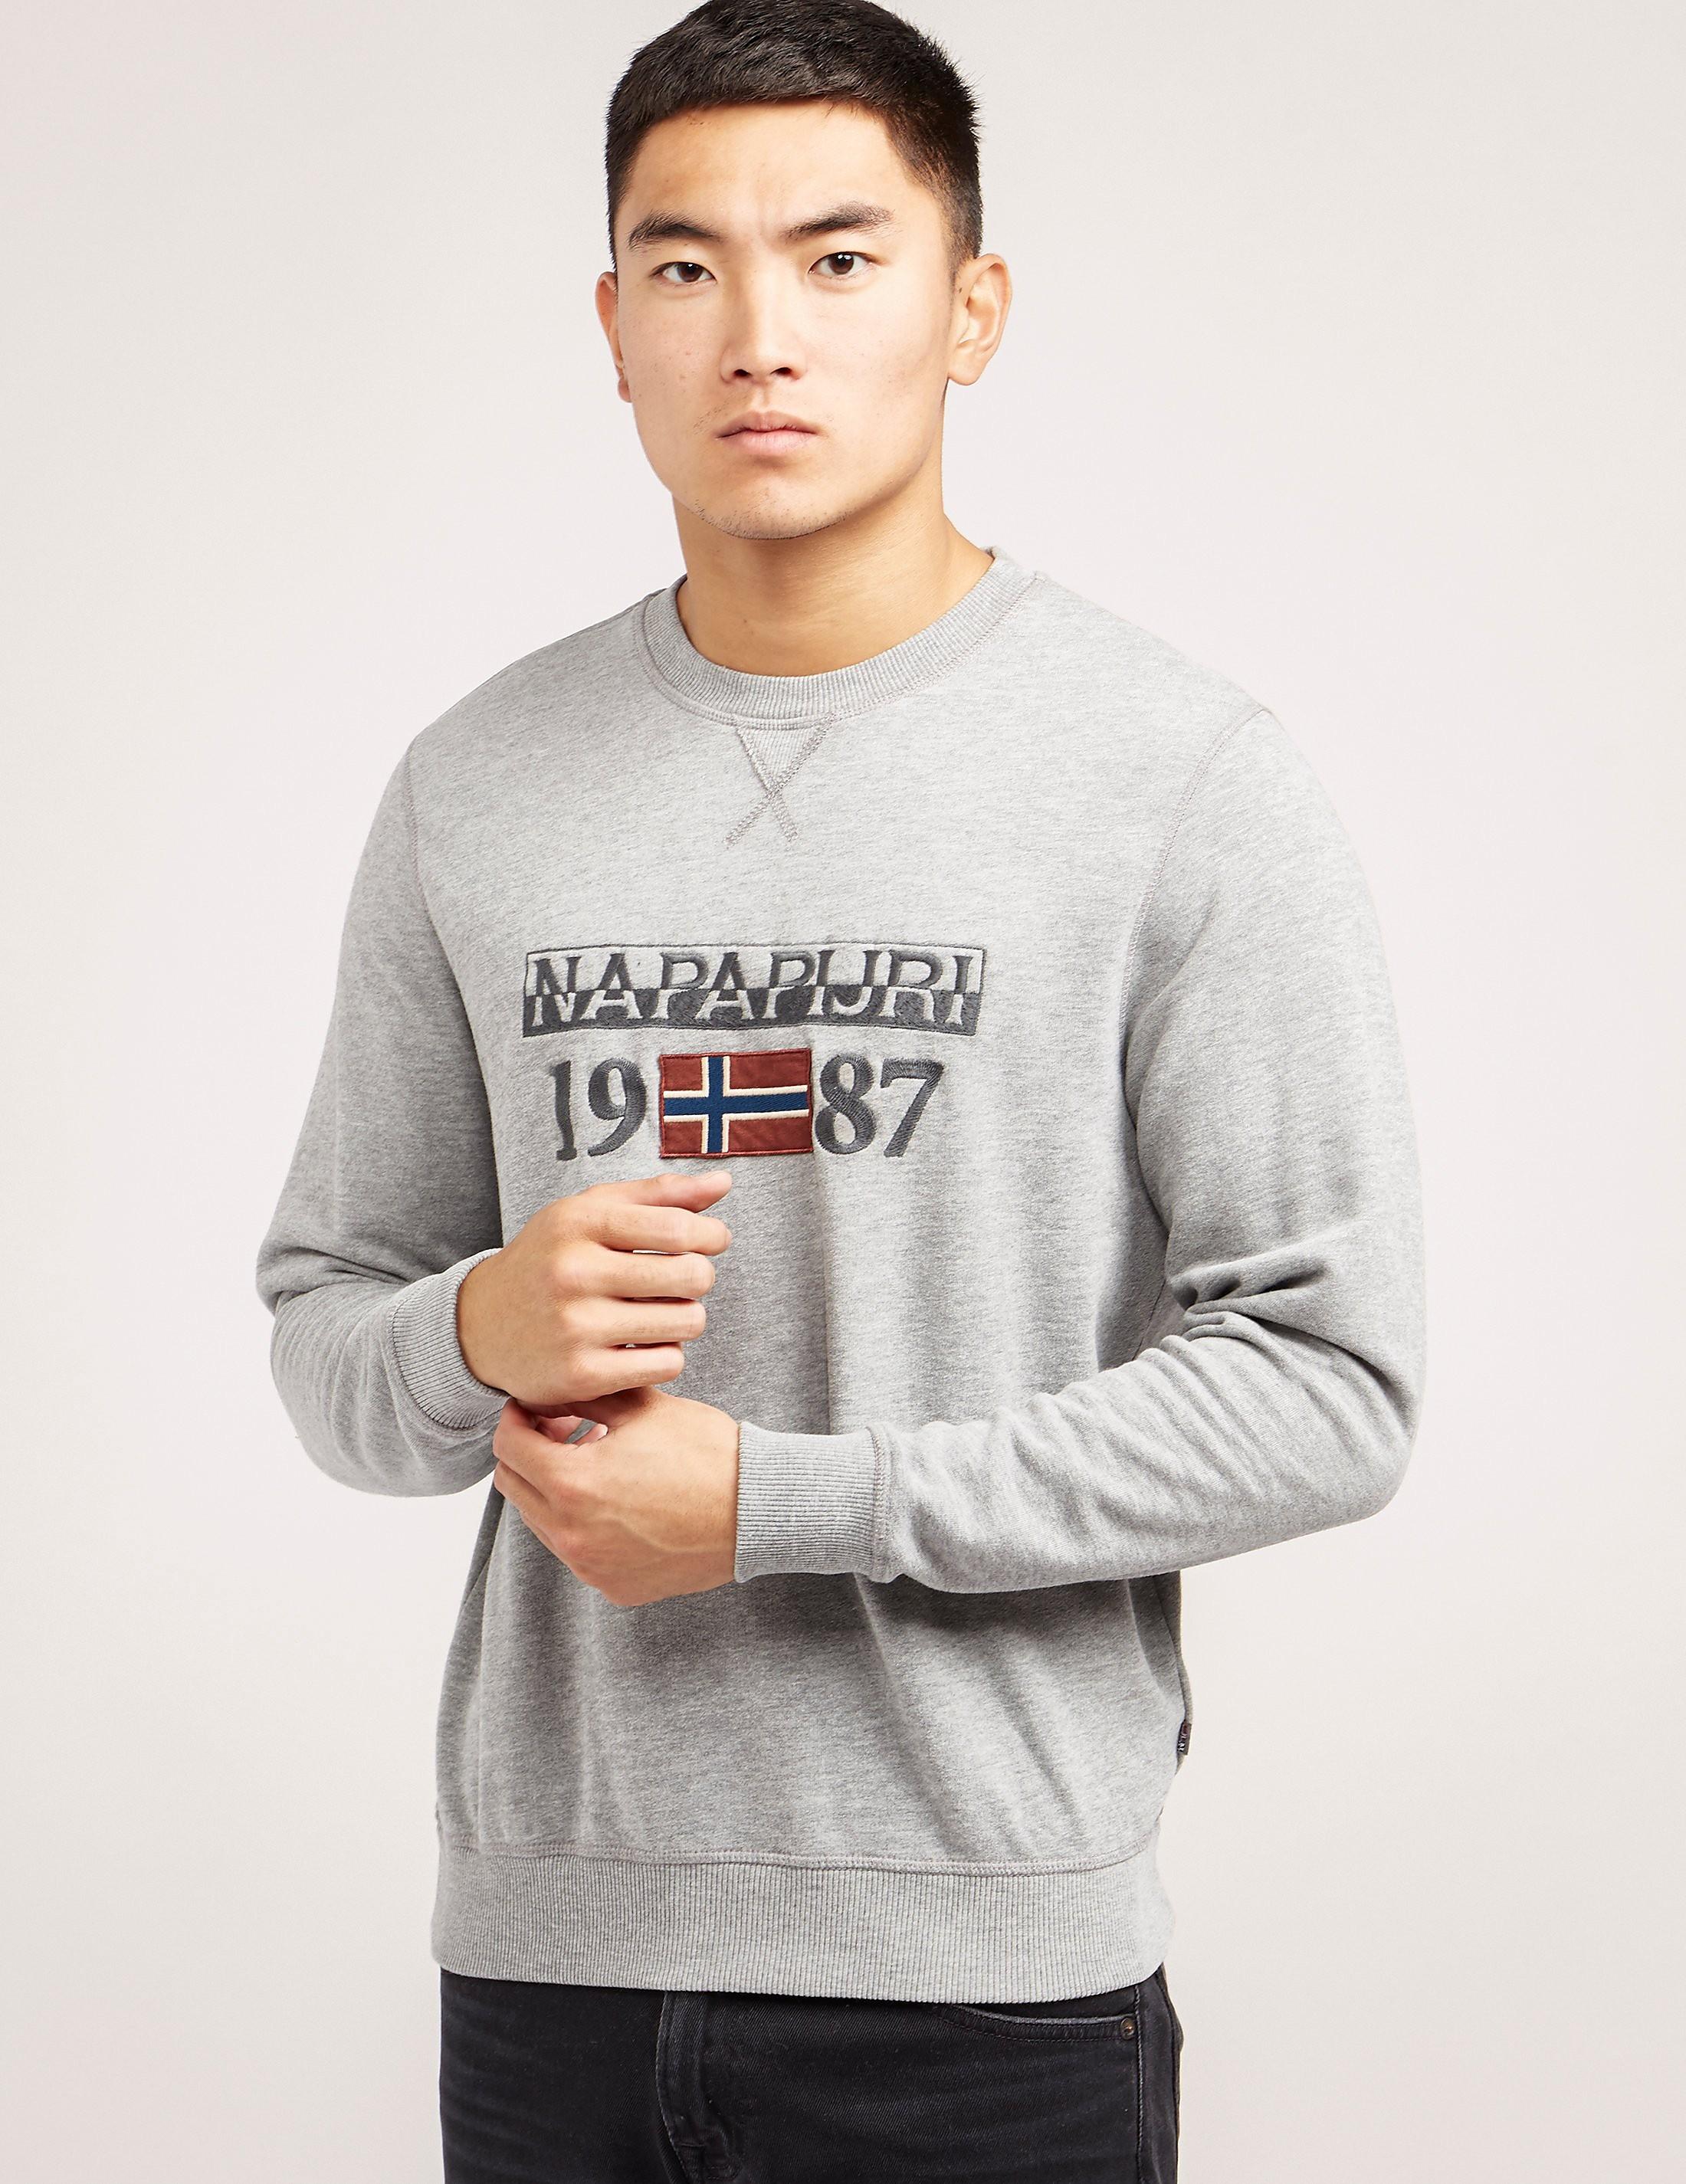 Napapijri Berthow Crew Sweatshirt